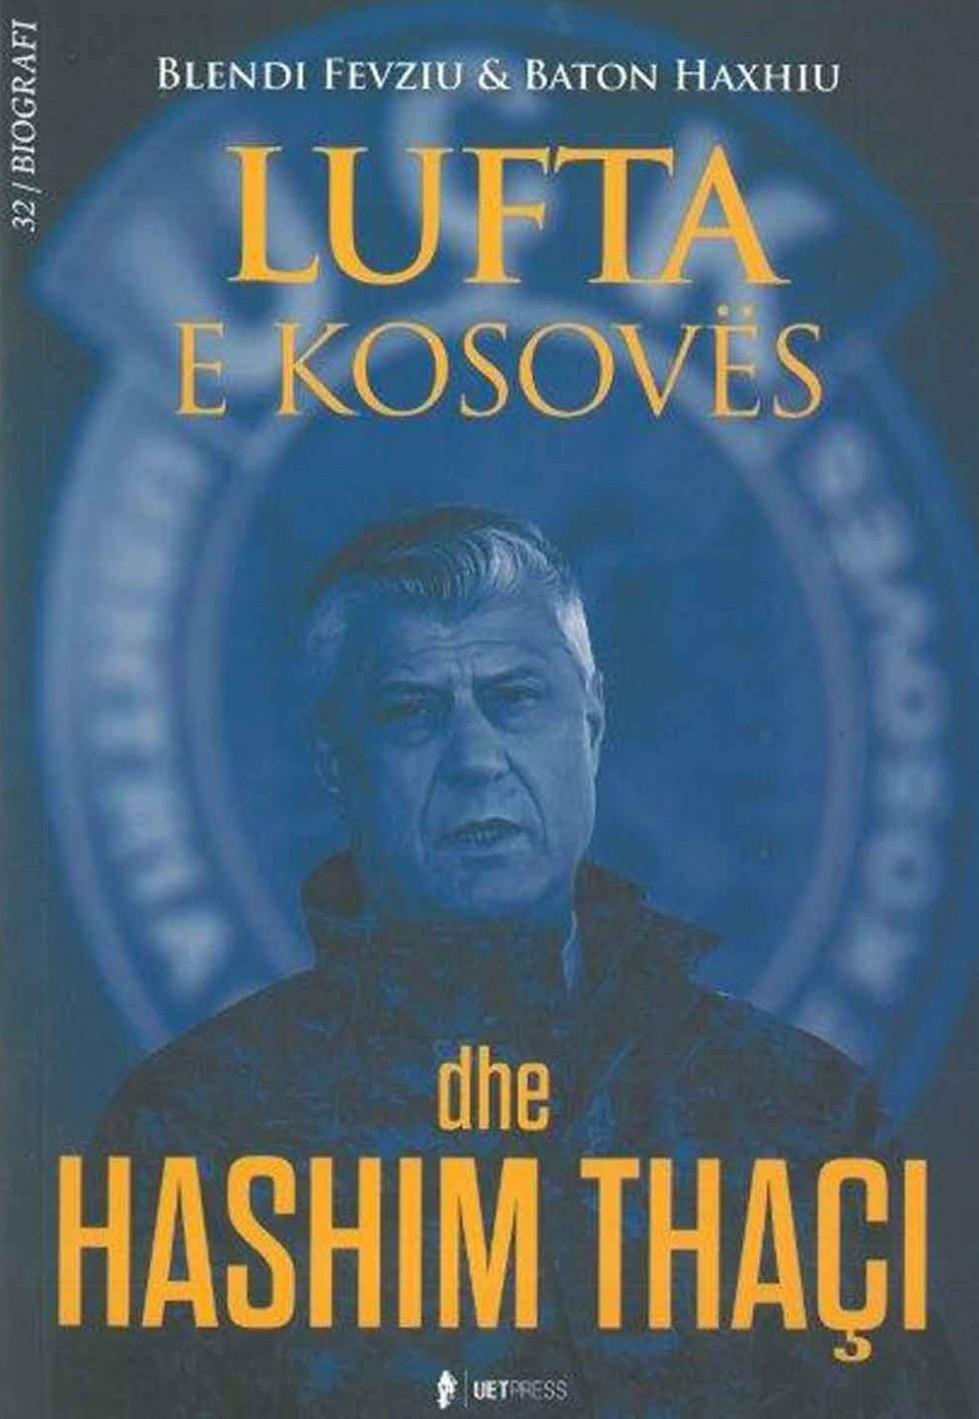 Lufta e Kosoves dhe Hashim Thaci